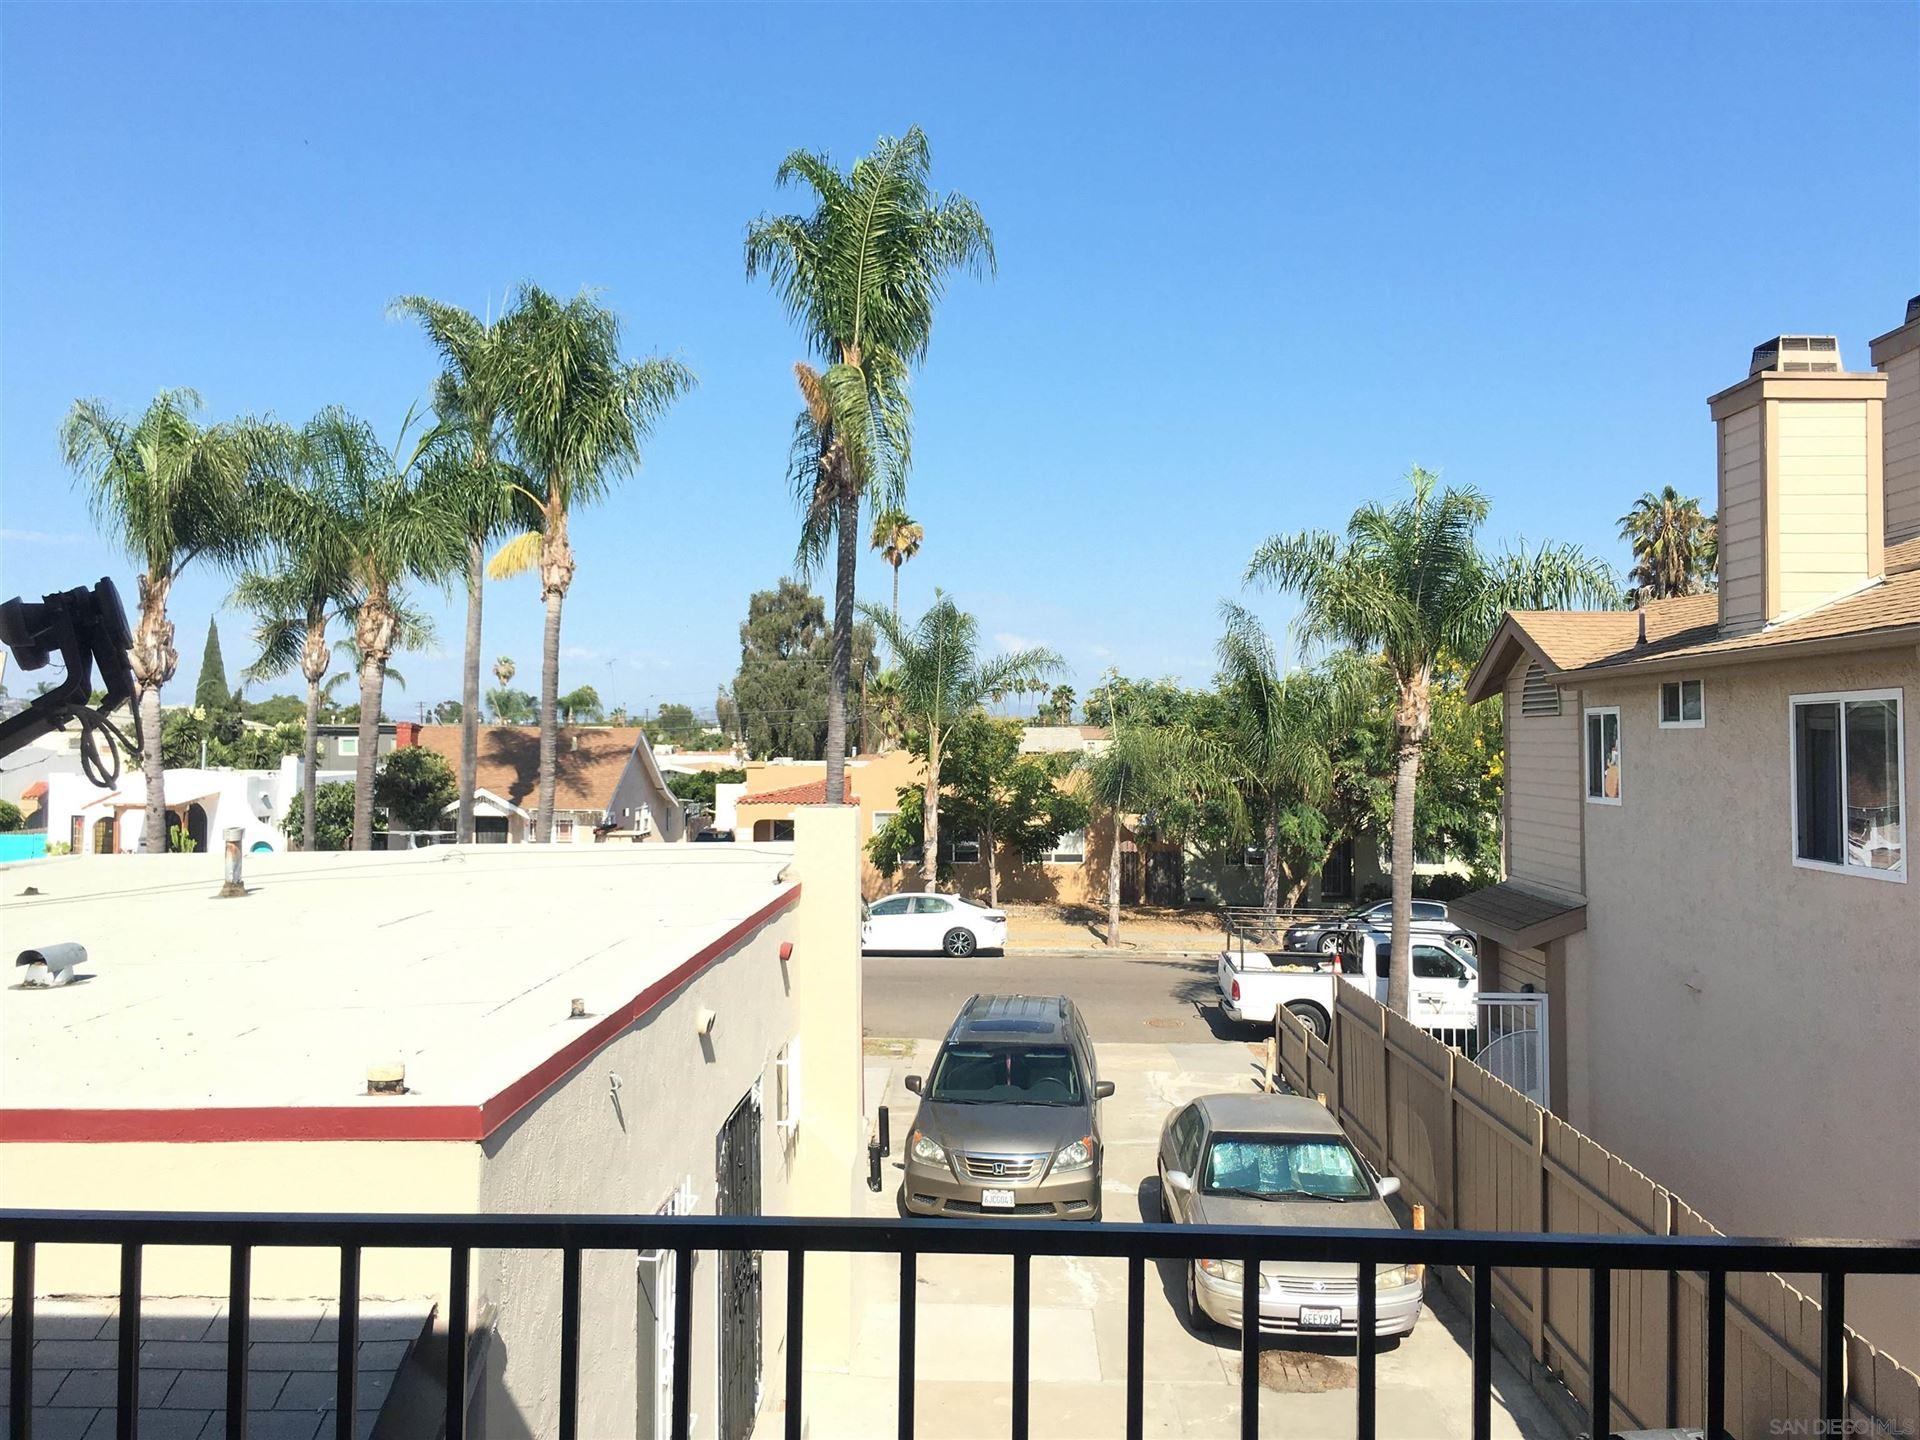 Photo of 4338-40 39th Street, San Diego, CA 92105 (MLS # 210025981)